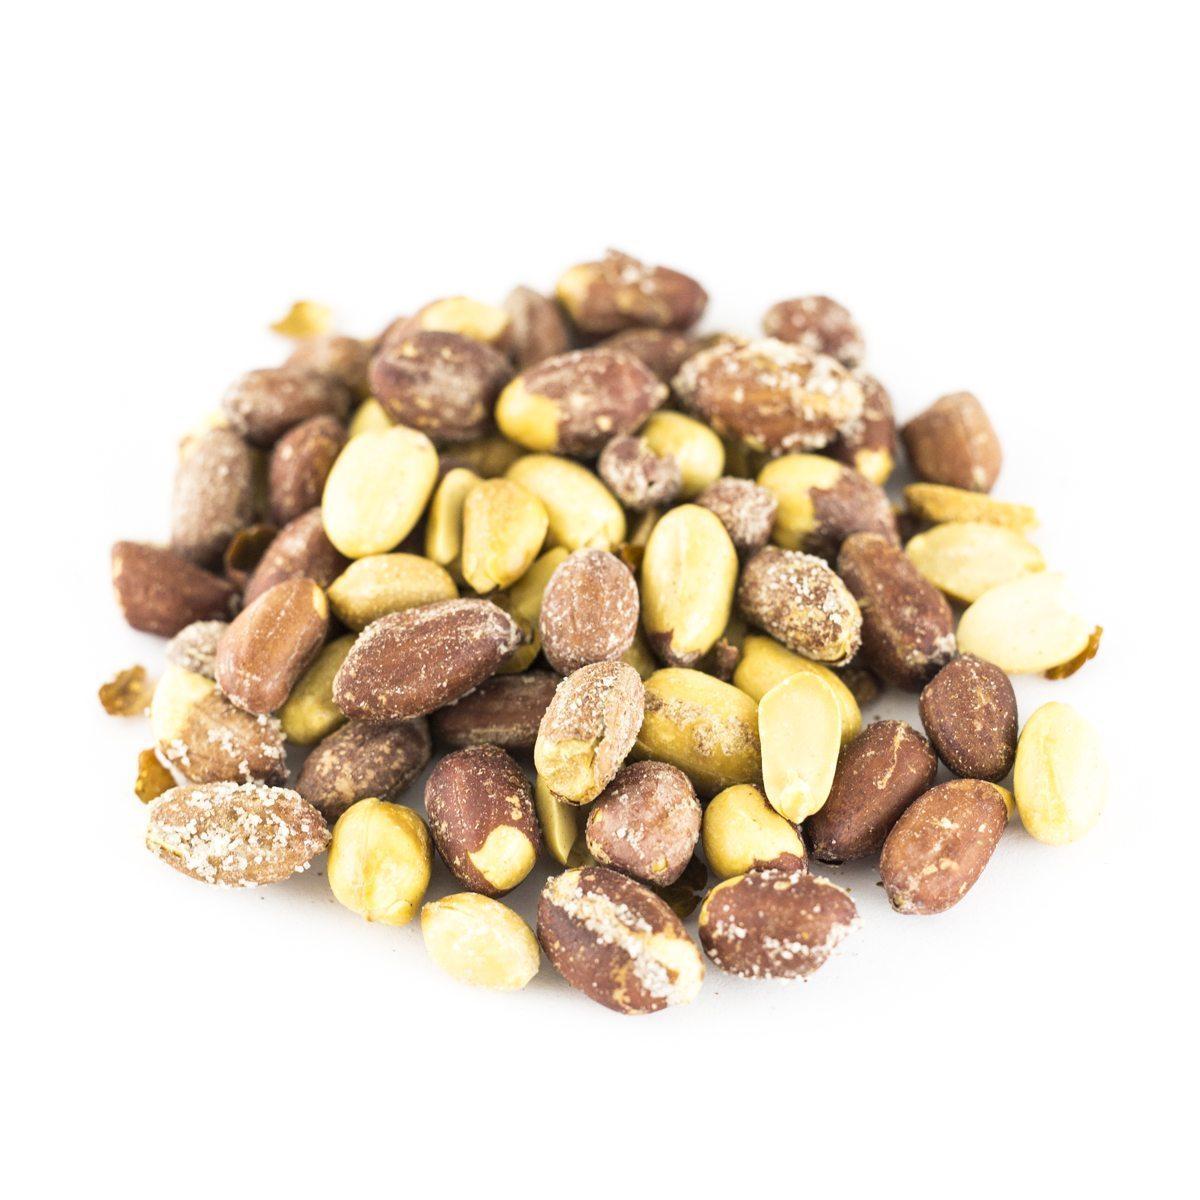 Kikiriki pečeni slani (100g)